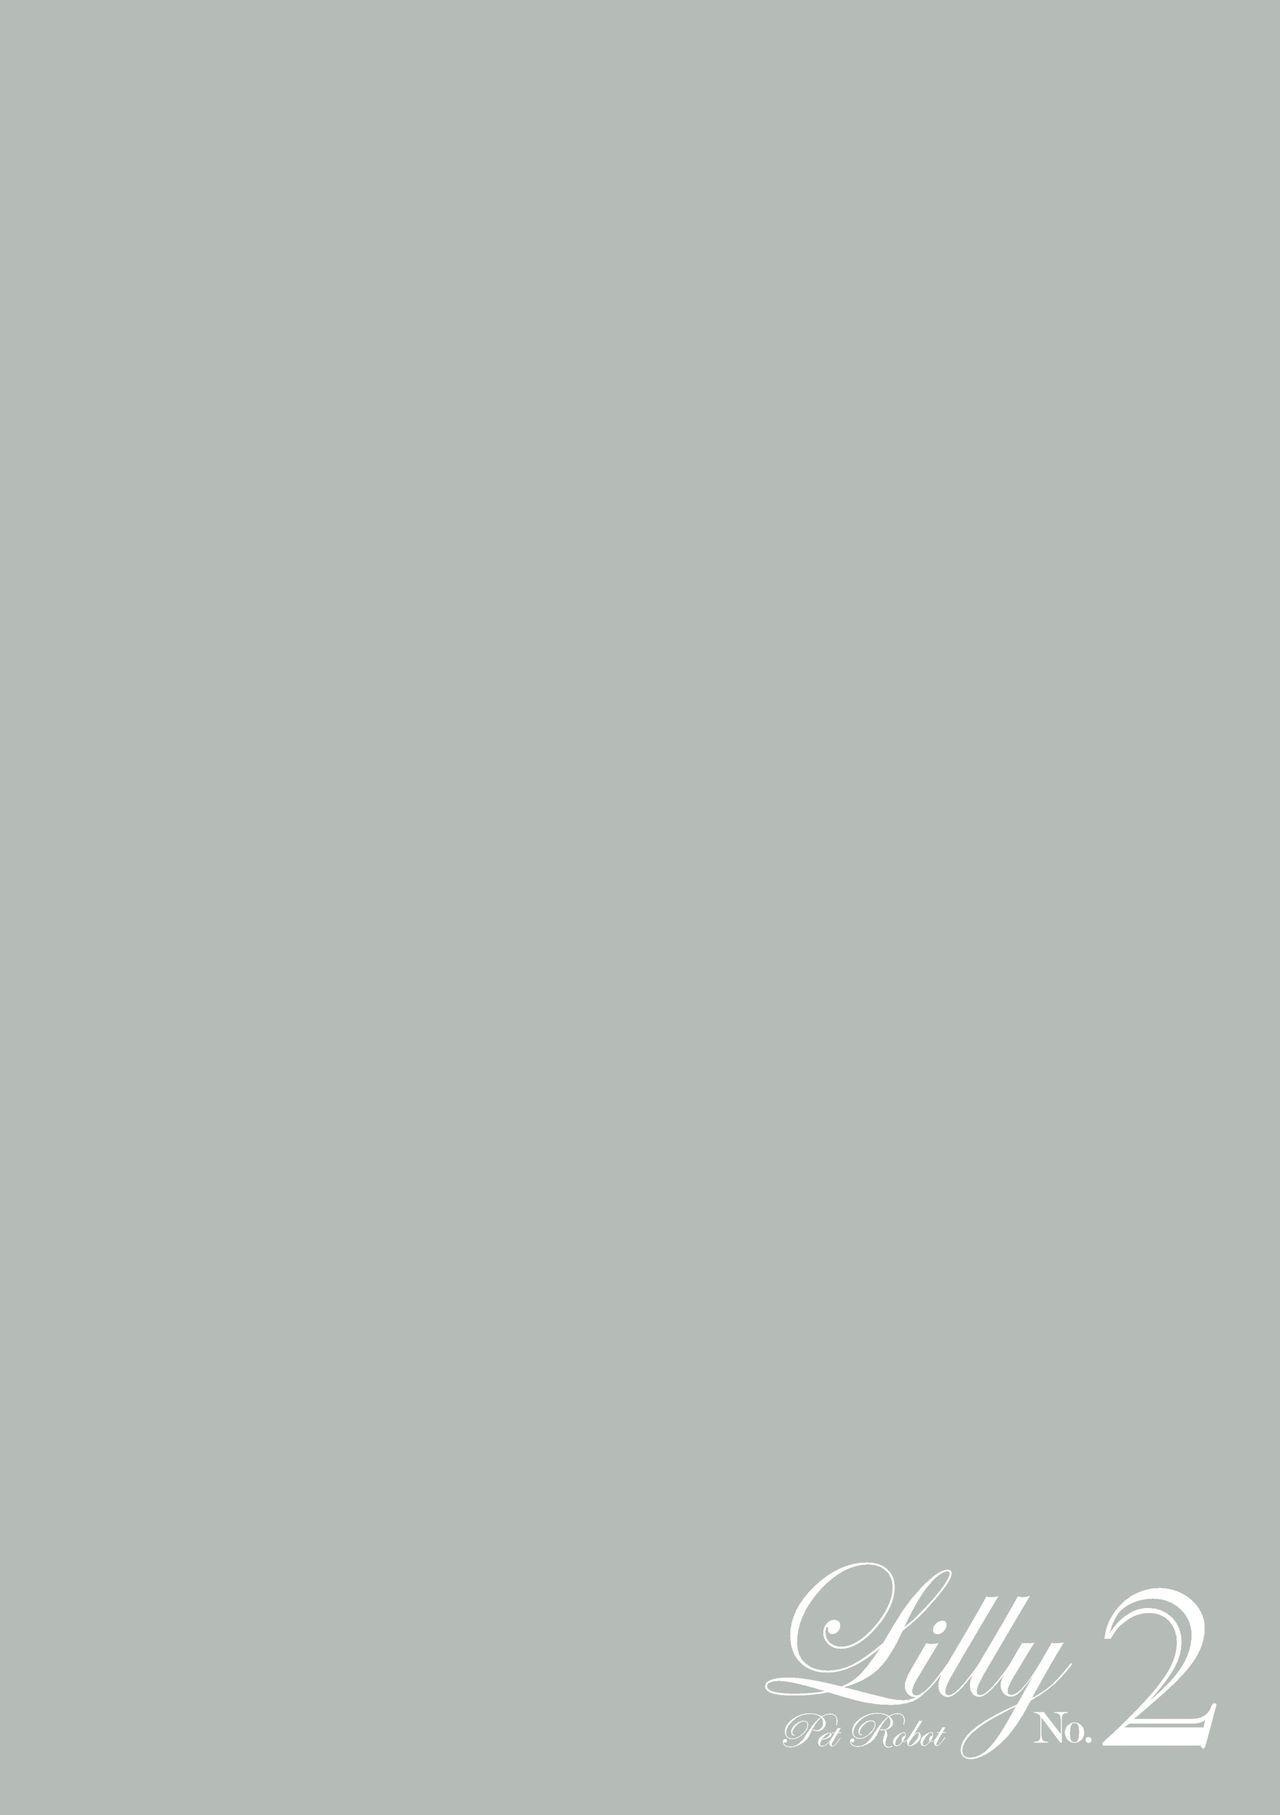 Aigan Robot Lilly - Pet Robot Lilly Vol. 2 4